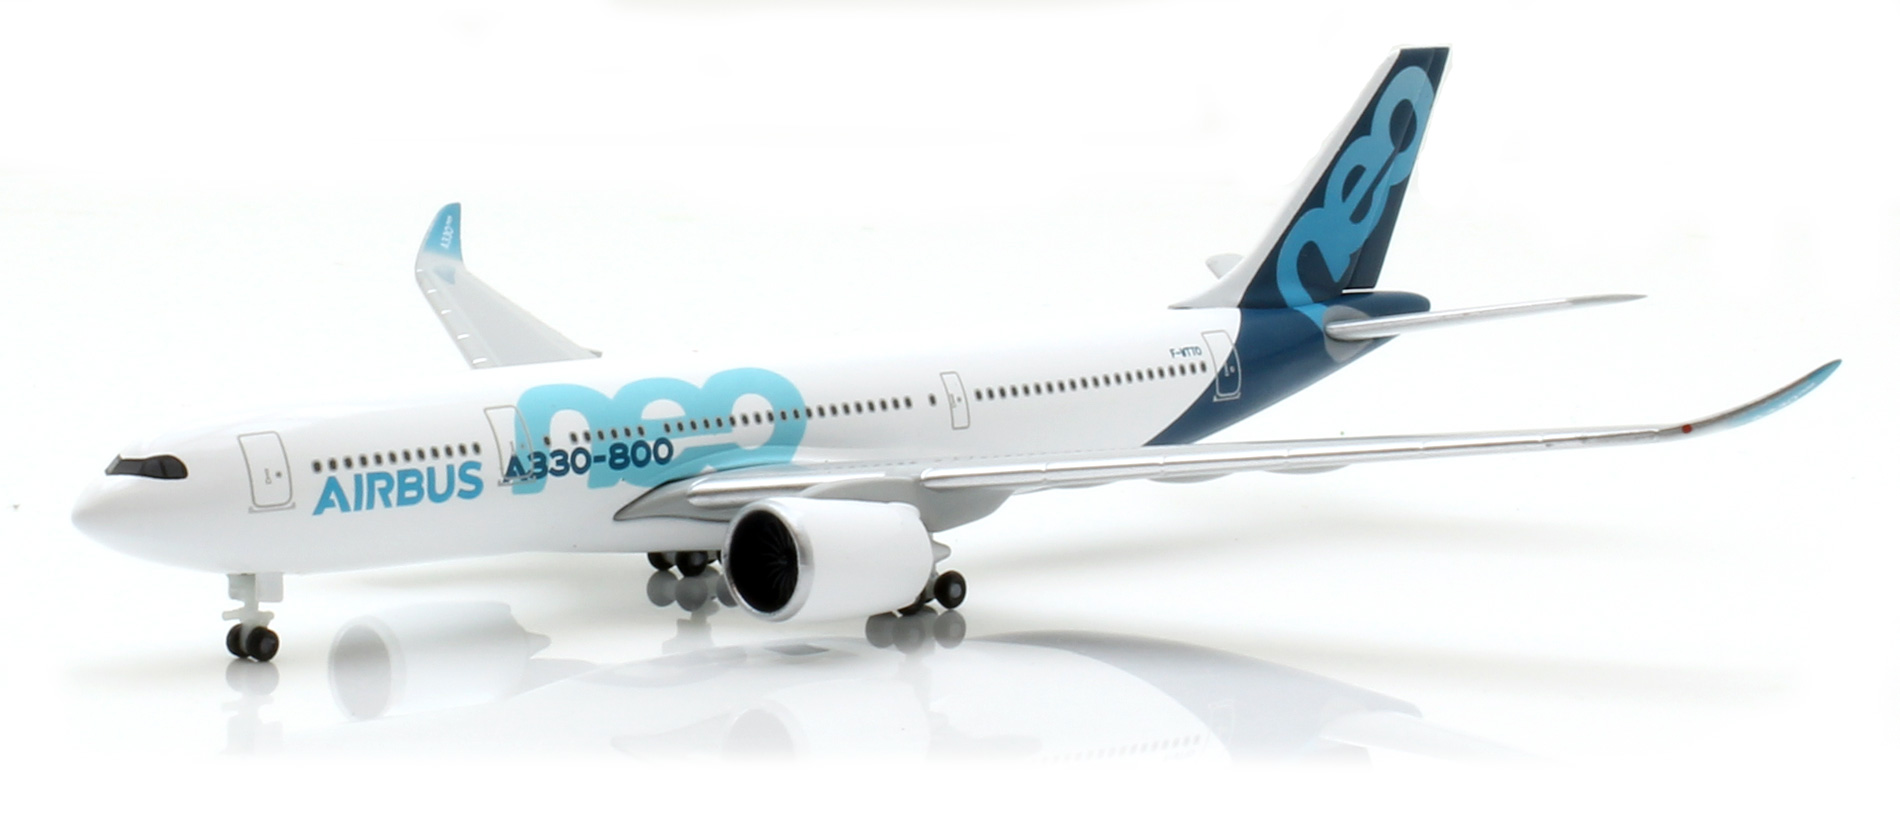 Herpa 533287 vía 1:500 Airbus A330-800 neo modellbahnshop-lippe.com